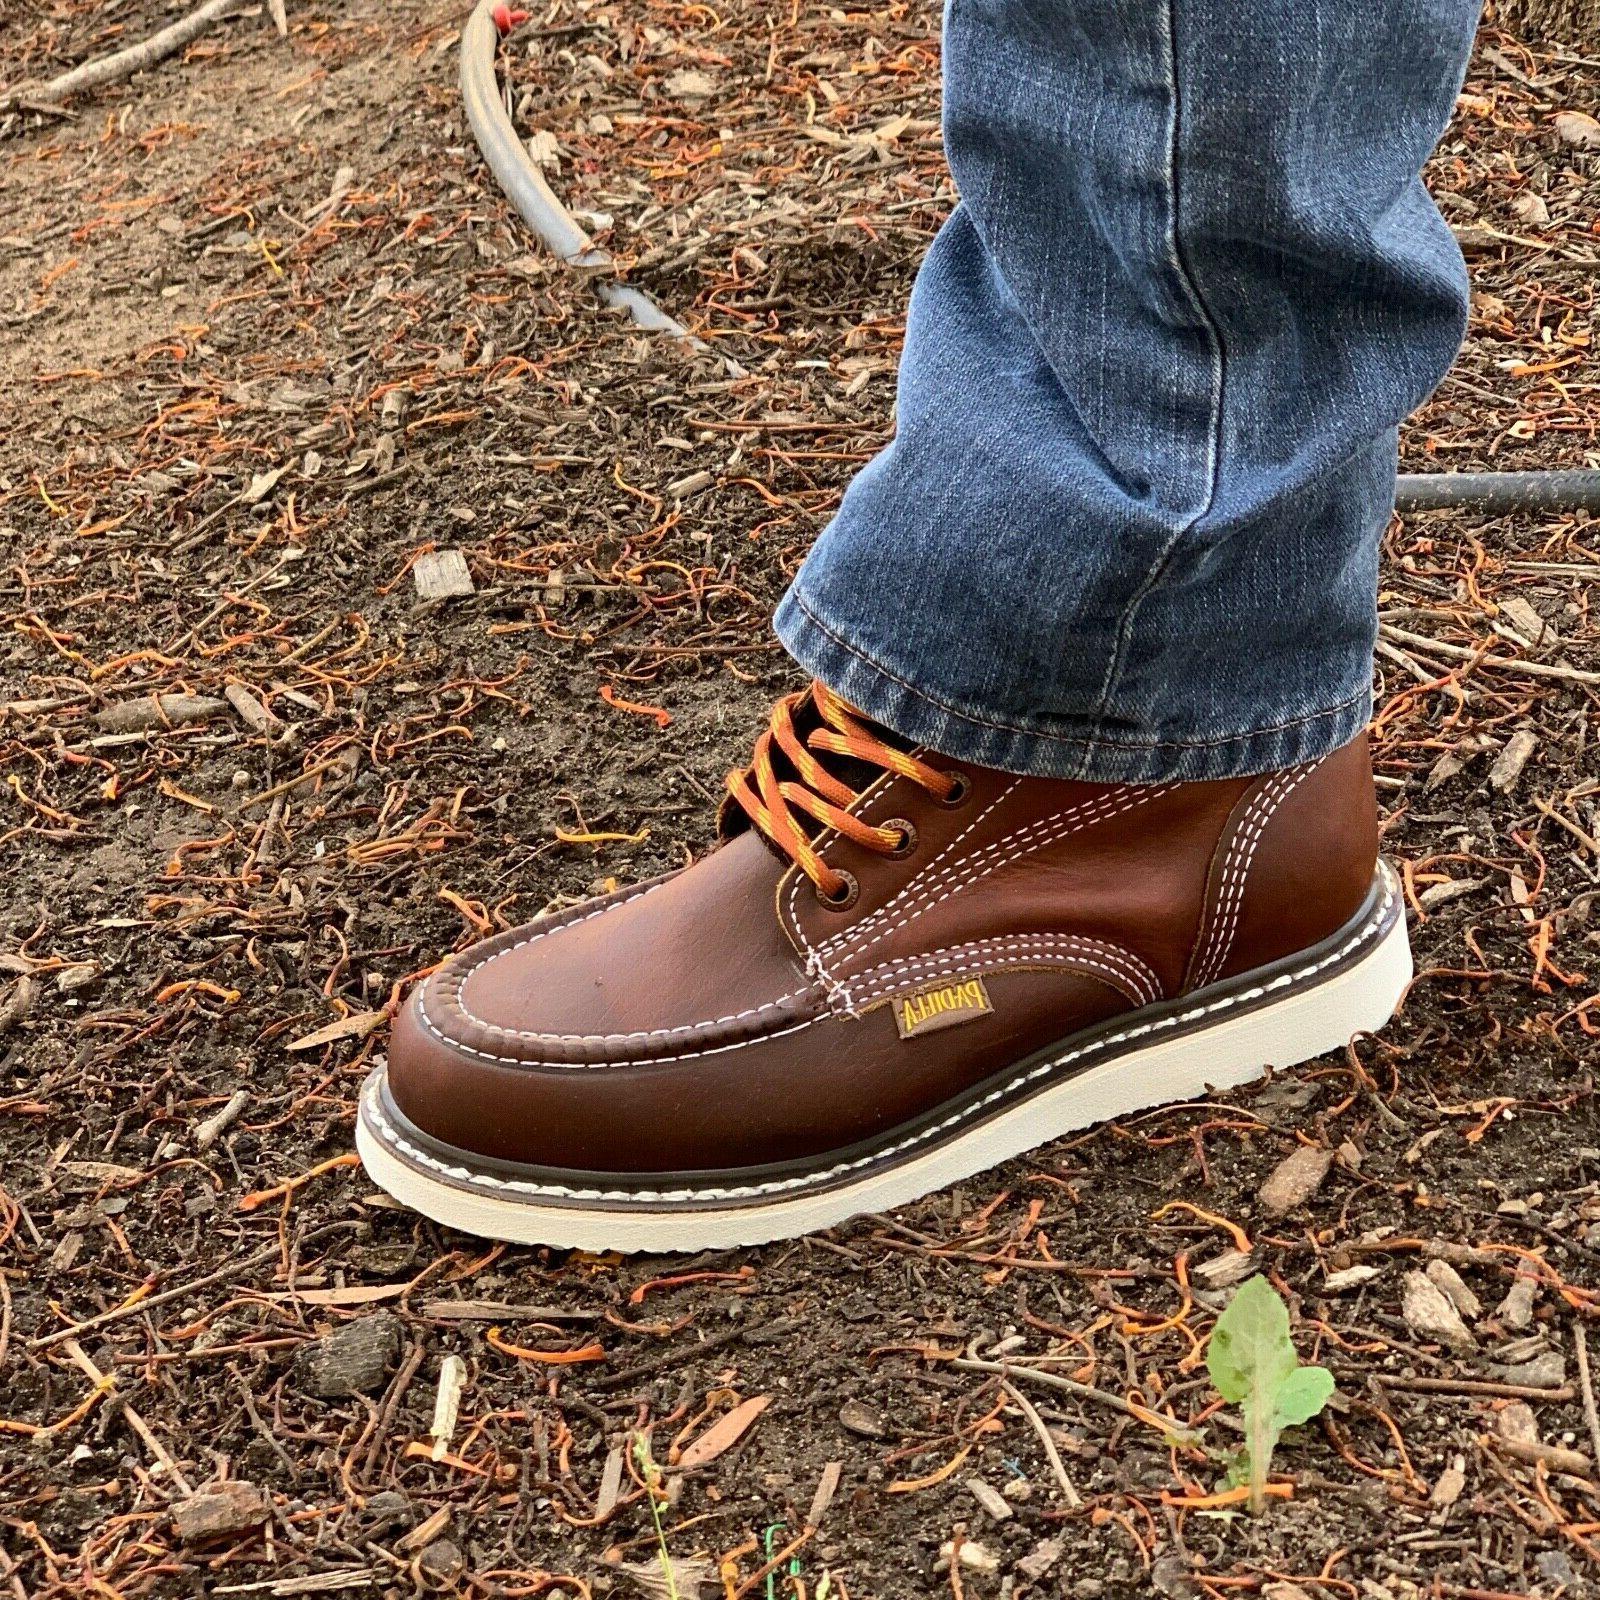 Men's Toe Safety Resistant Waterproof Boots